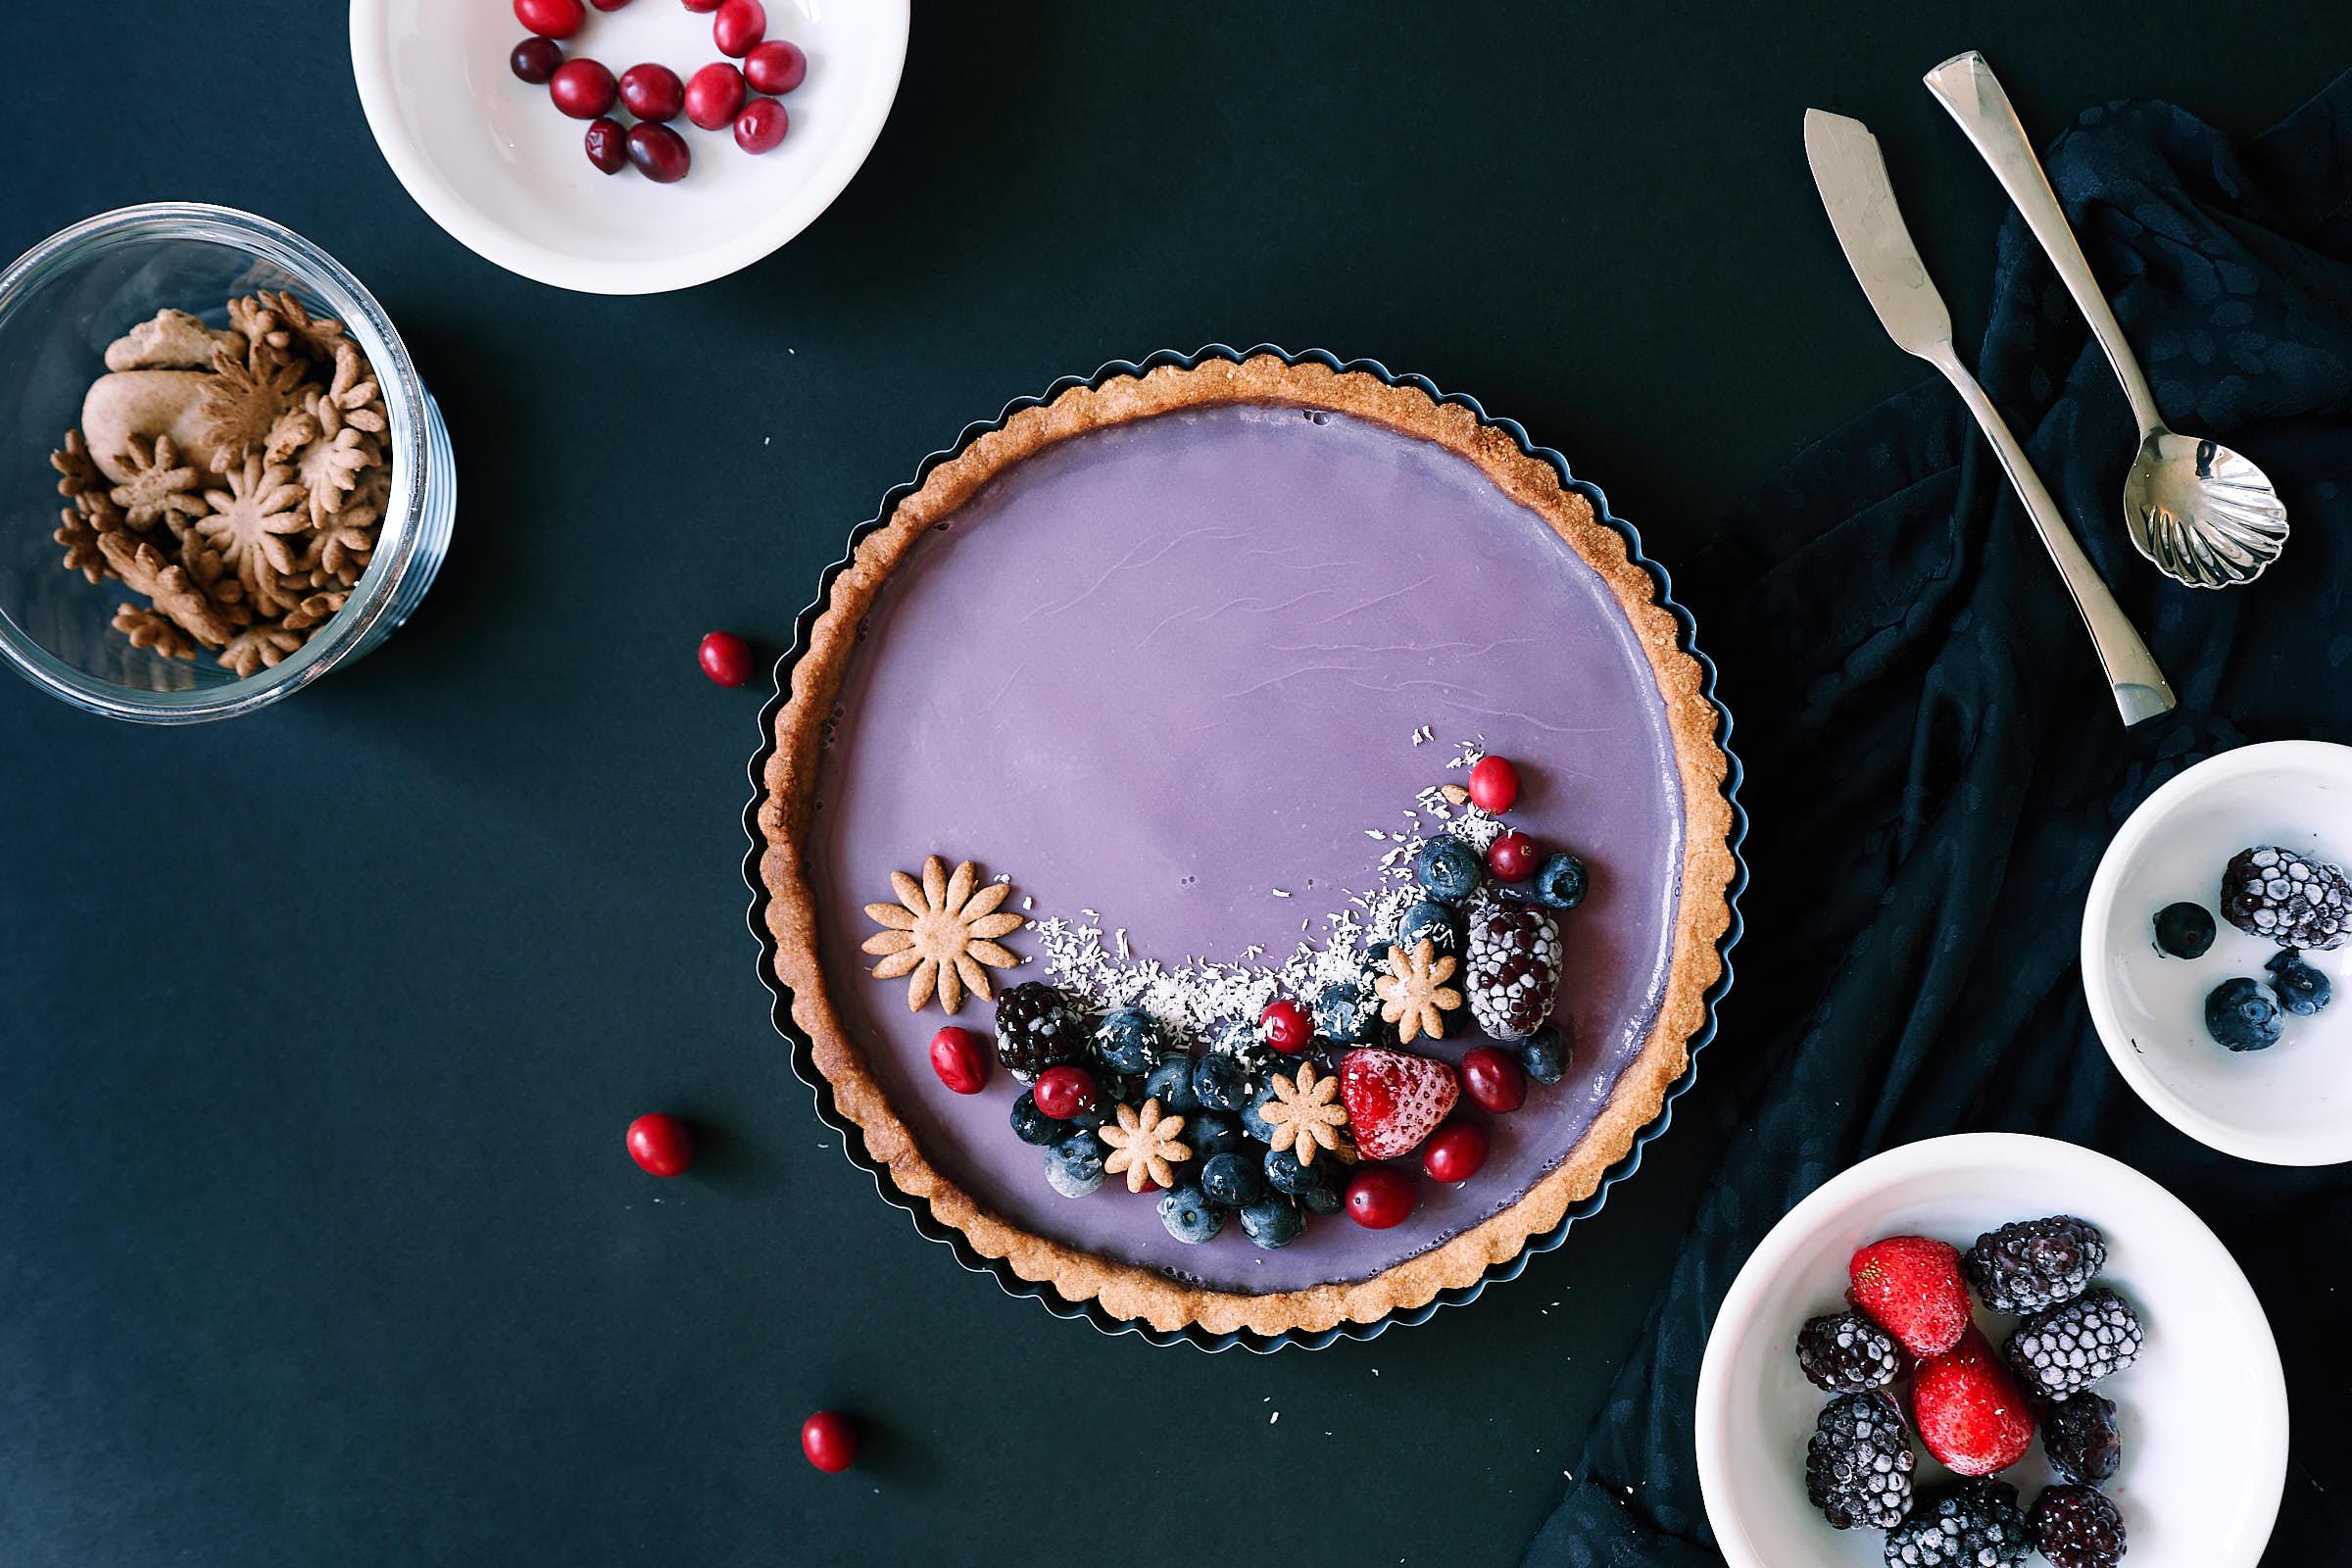 Lavender Tart Black Moody Photo Afewgoodclicks